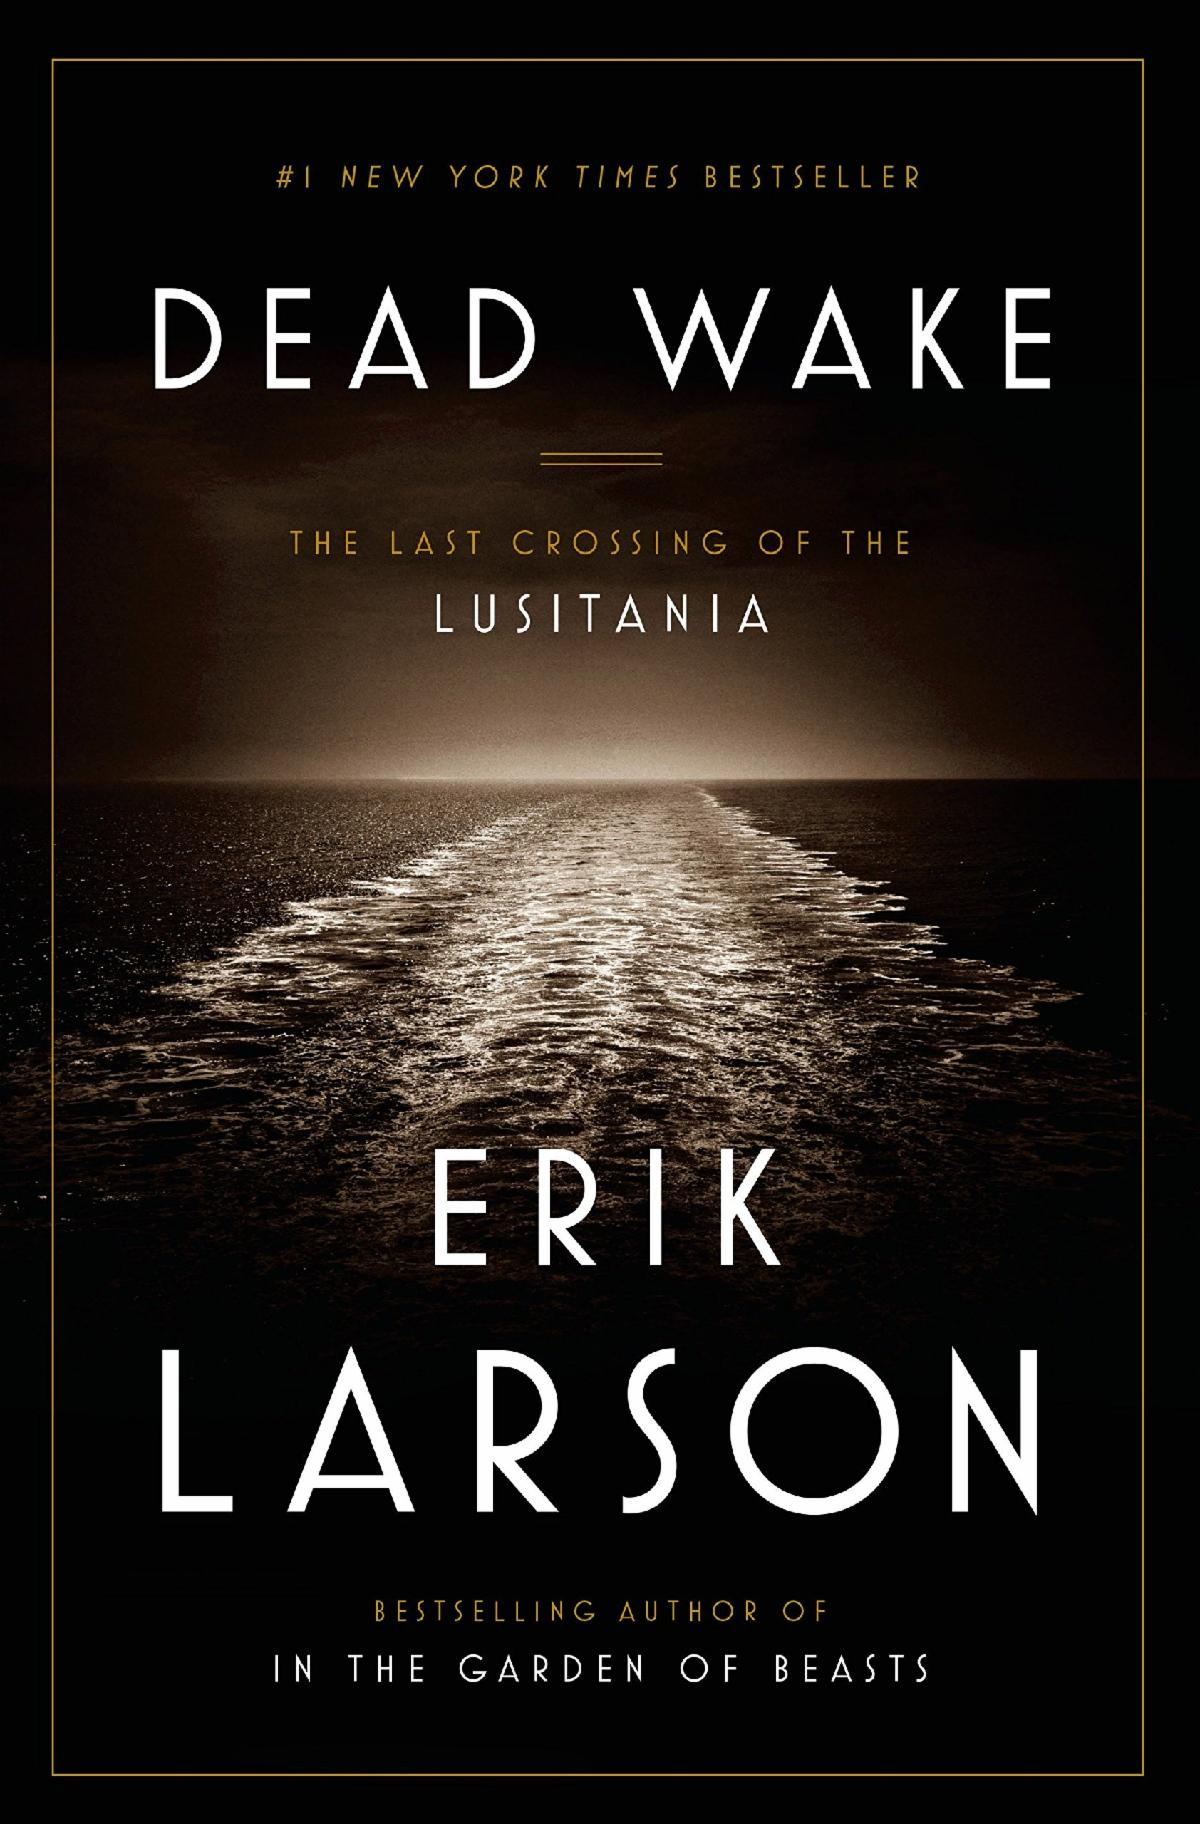 'Dead Wake' by Erik Larson